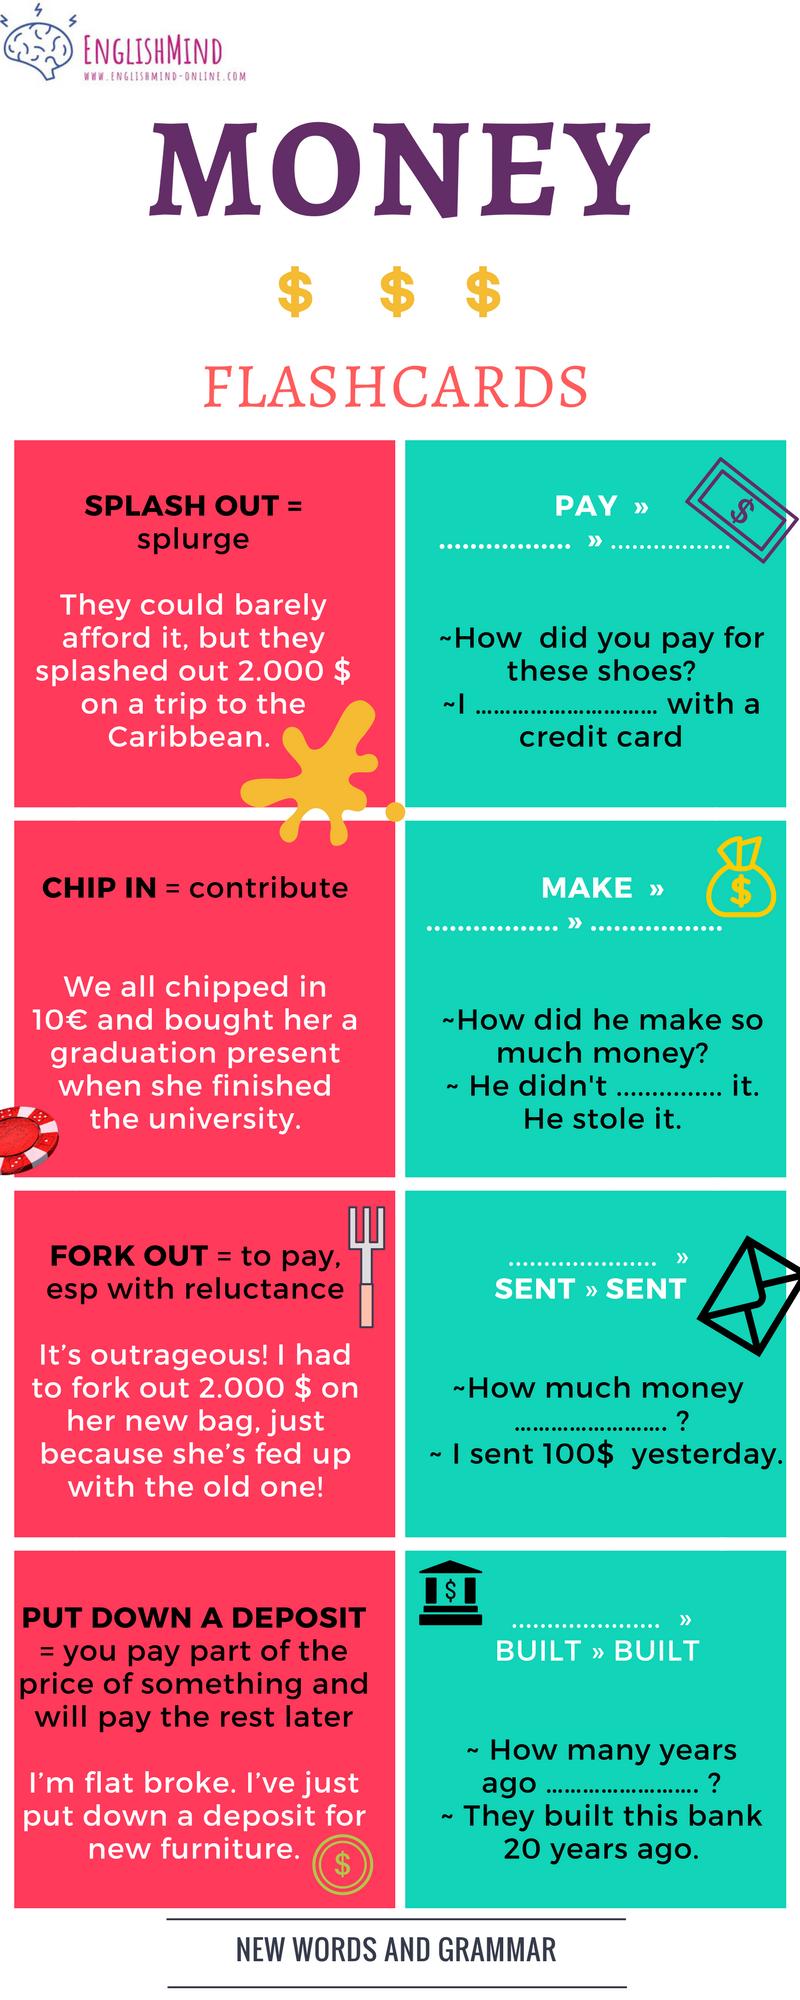 Money - phrasal verbs and grammar.